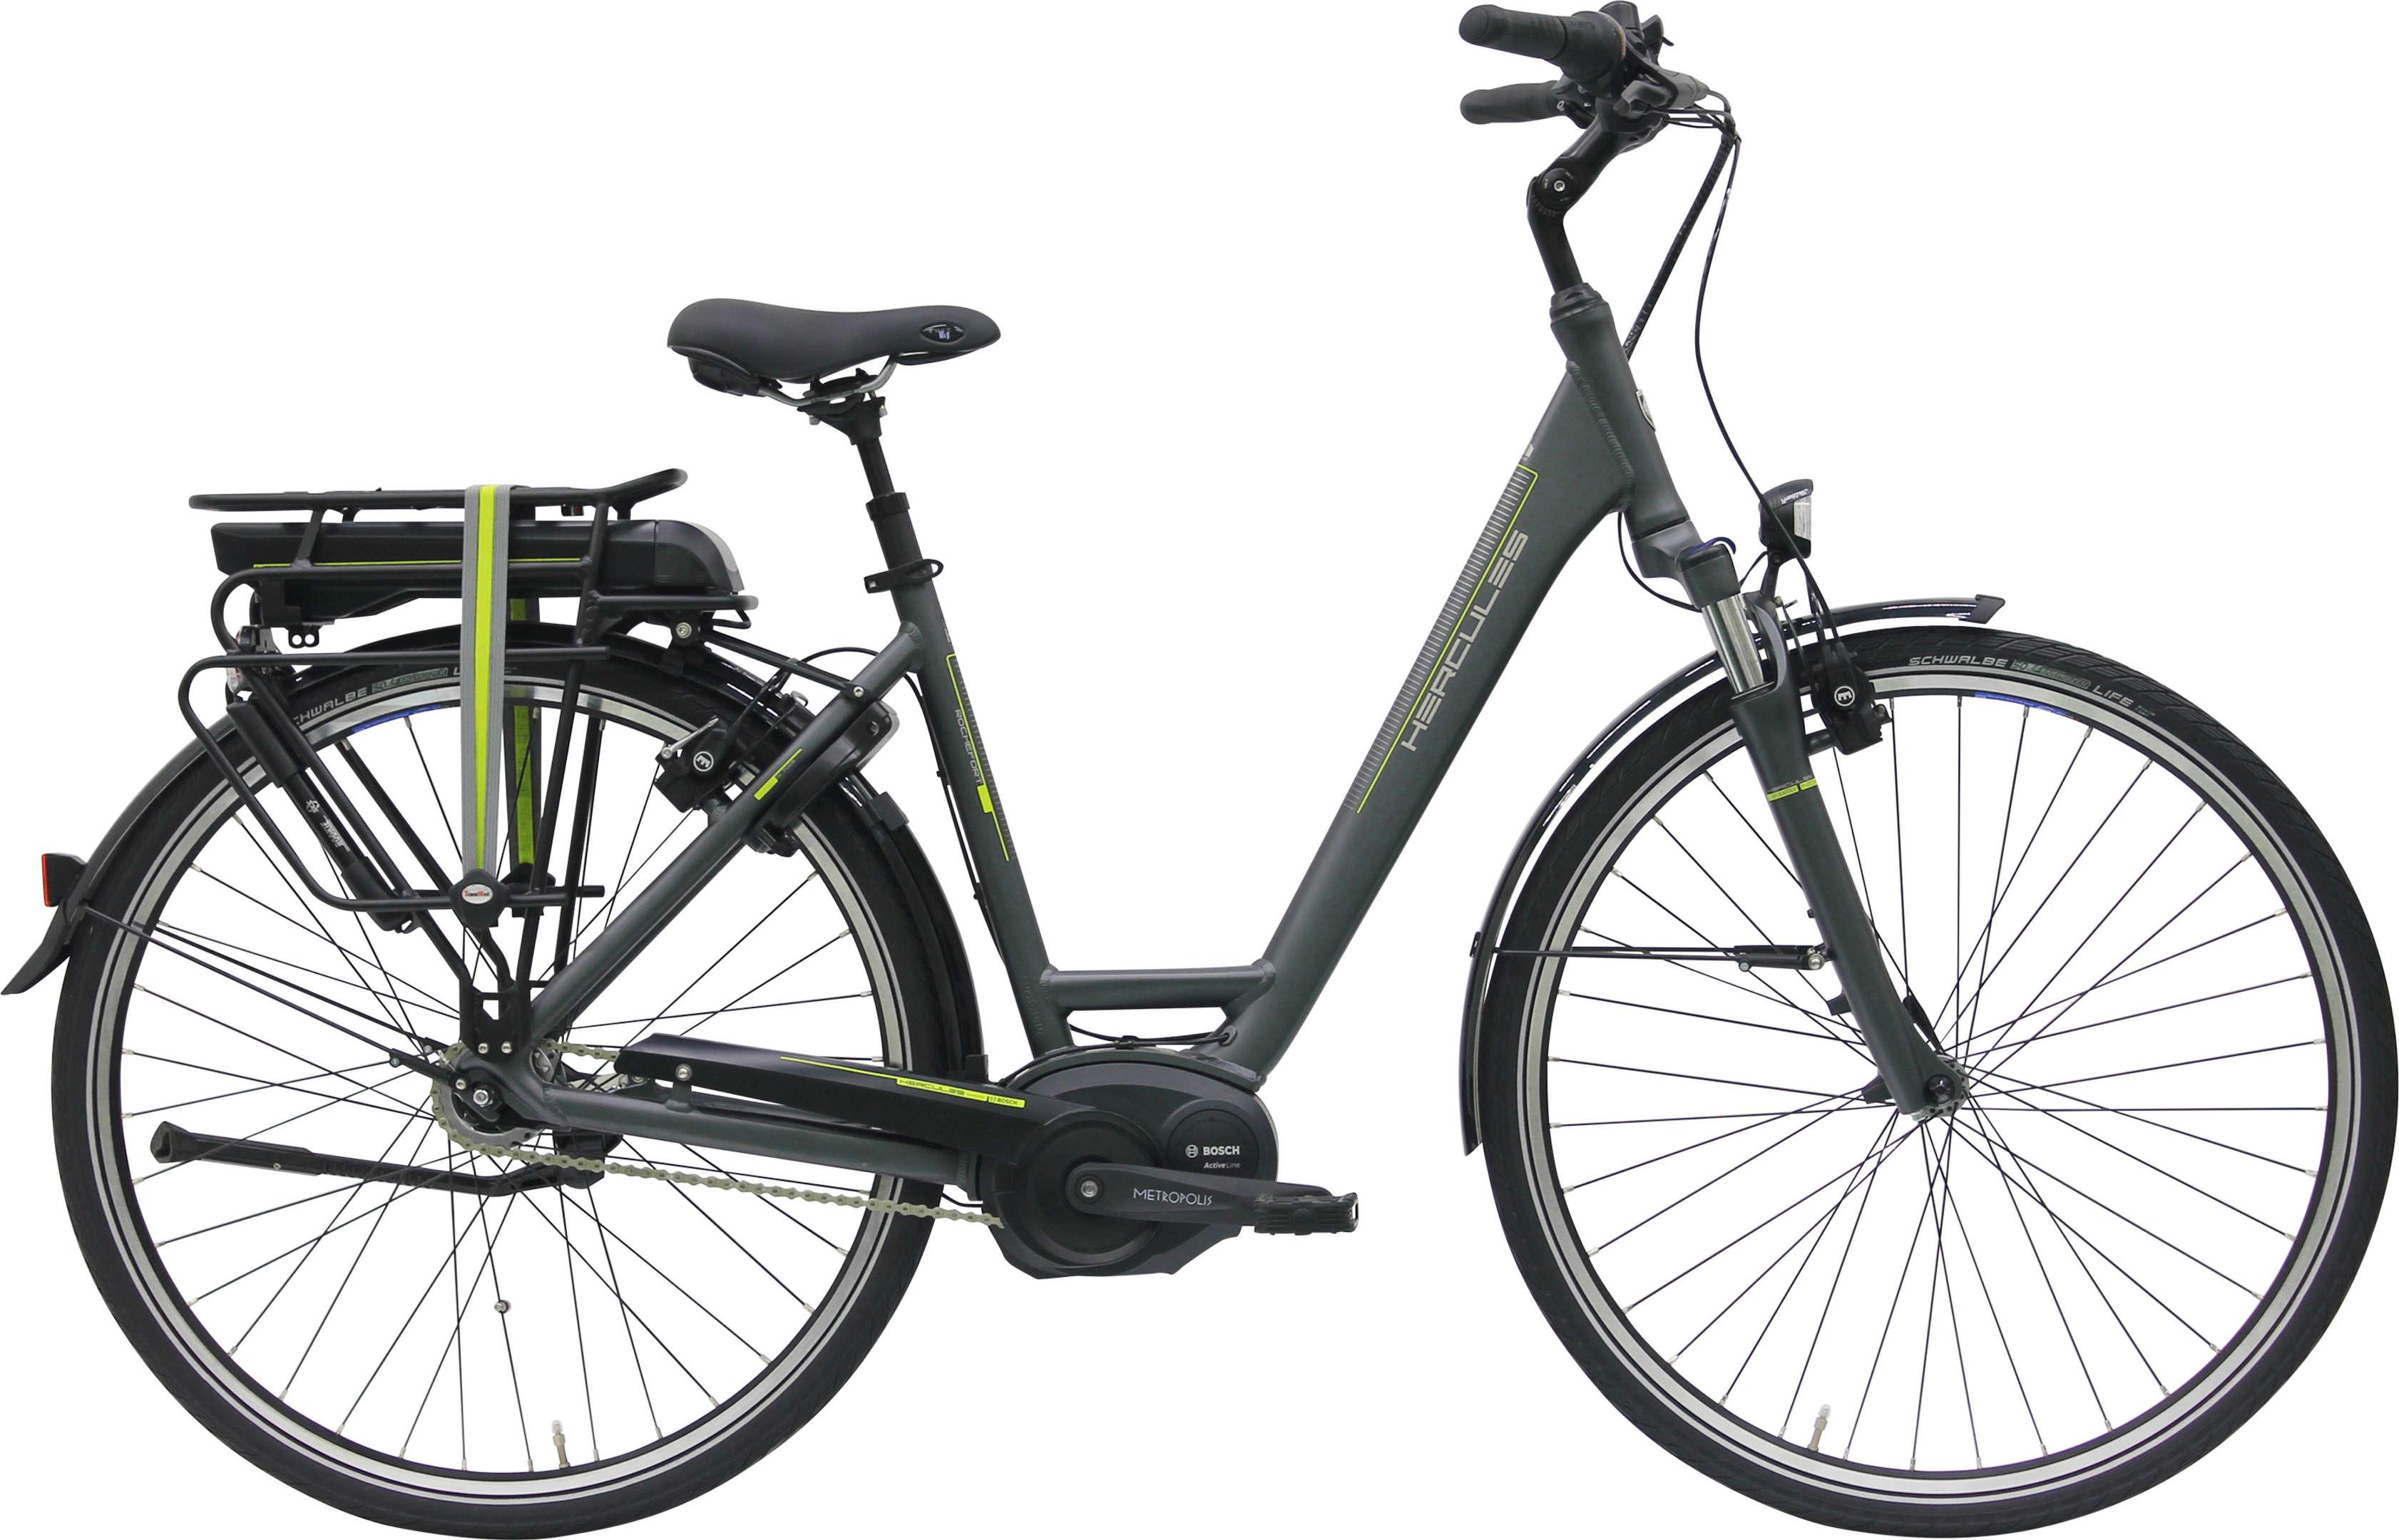 hercules e bike rochefort r7 eurorad bikeleasingeurorad. Black Bedroom Furniture Sets. Home Design Ideas